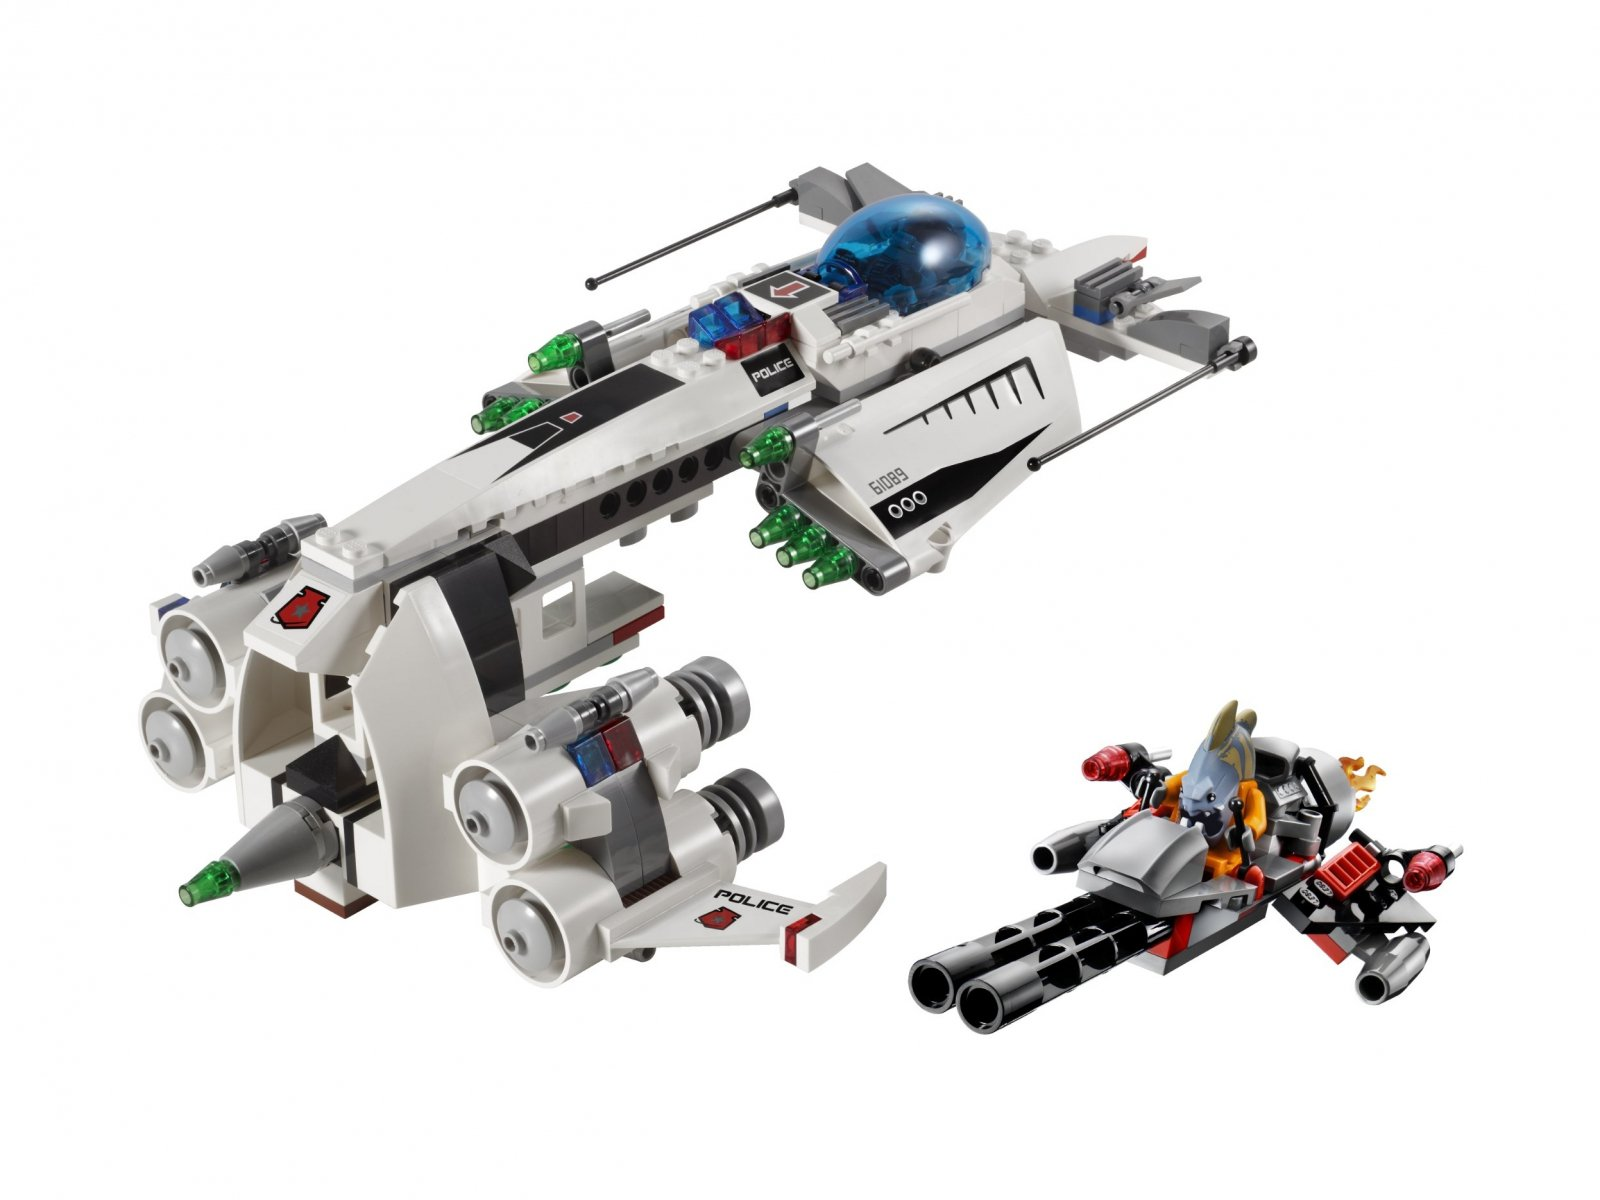 LEGO 5983 Undercover Cruiser